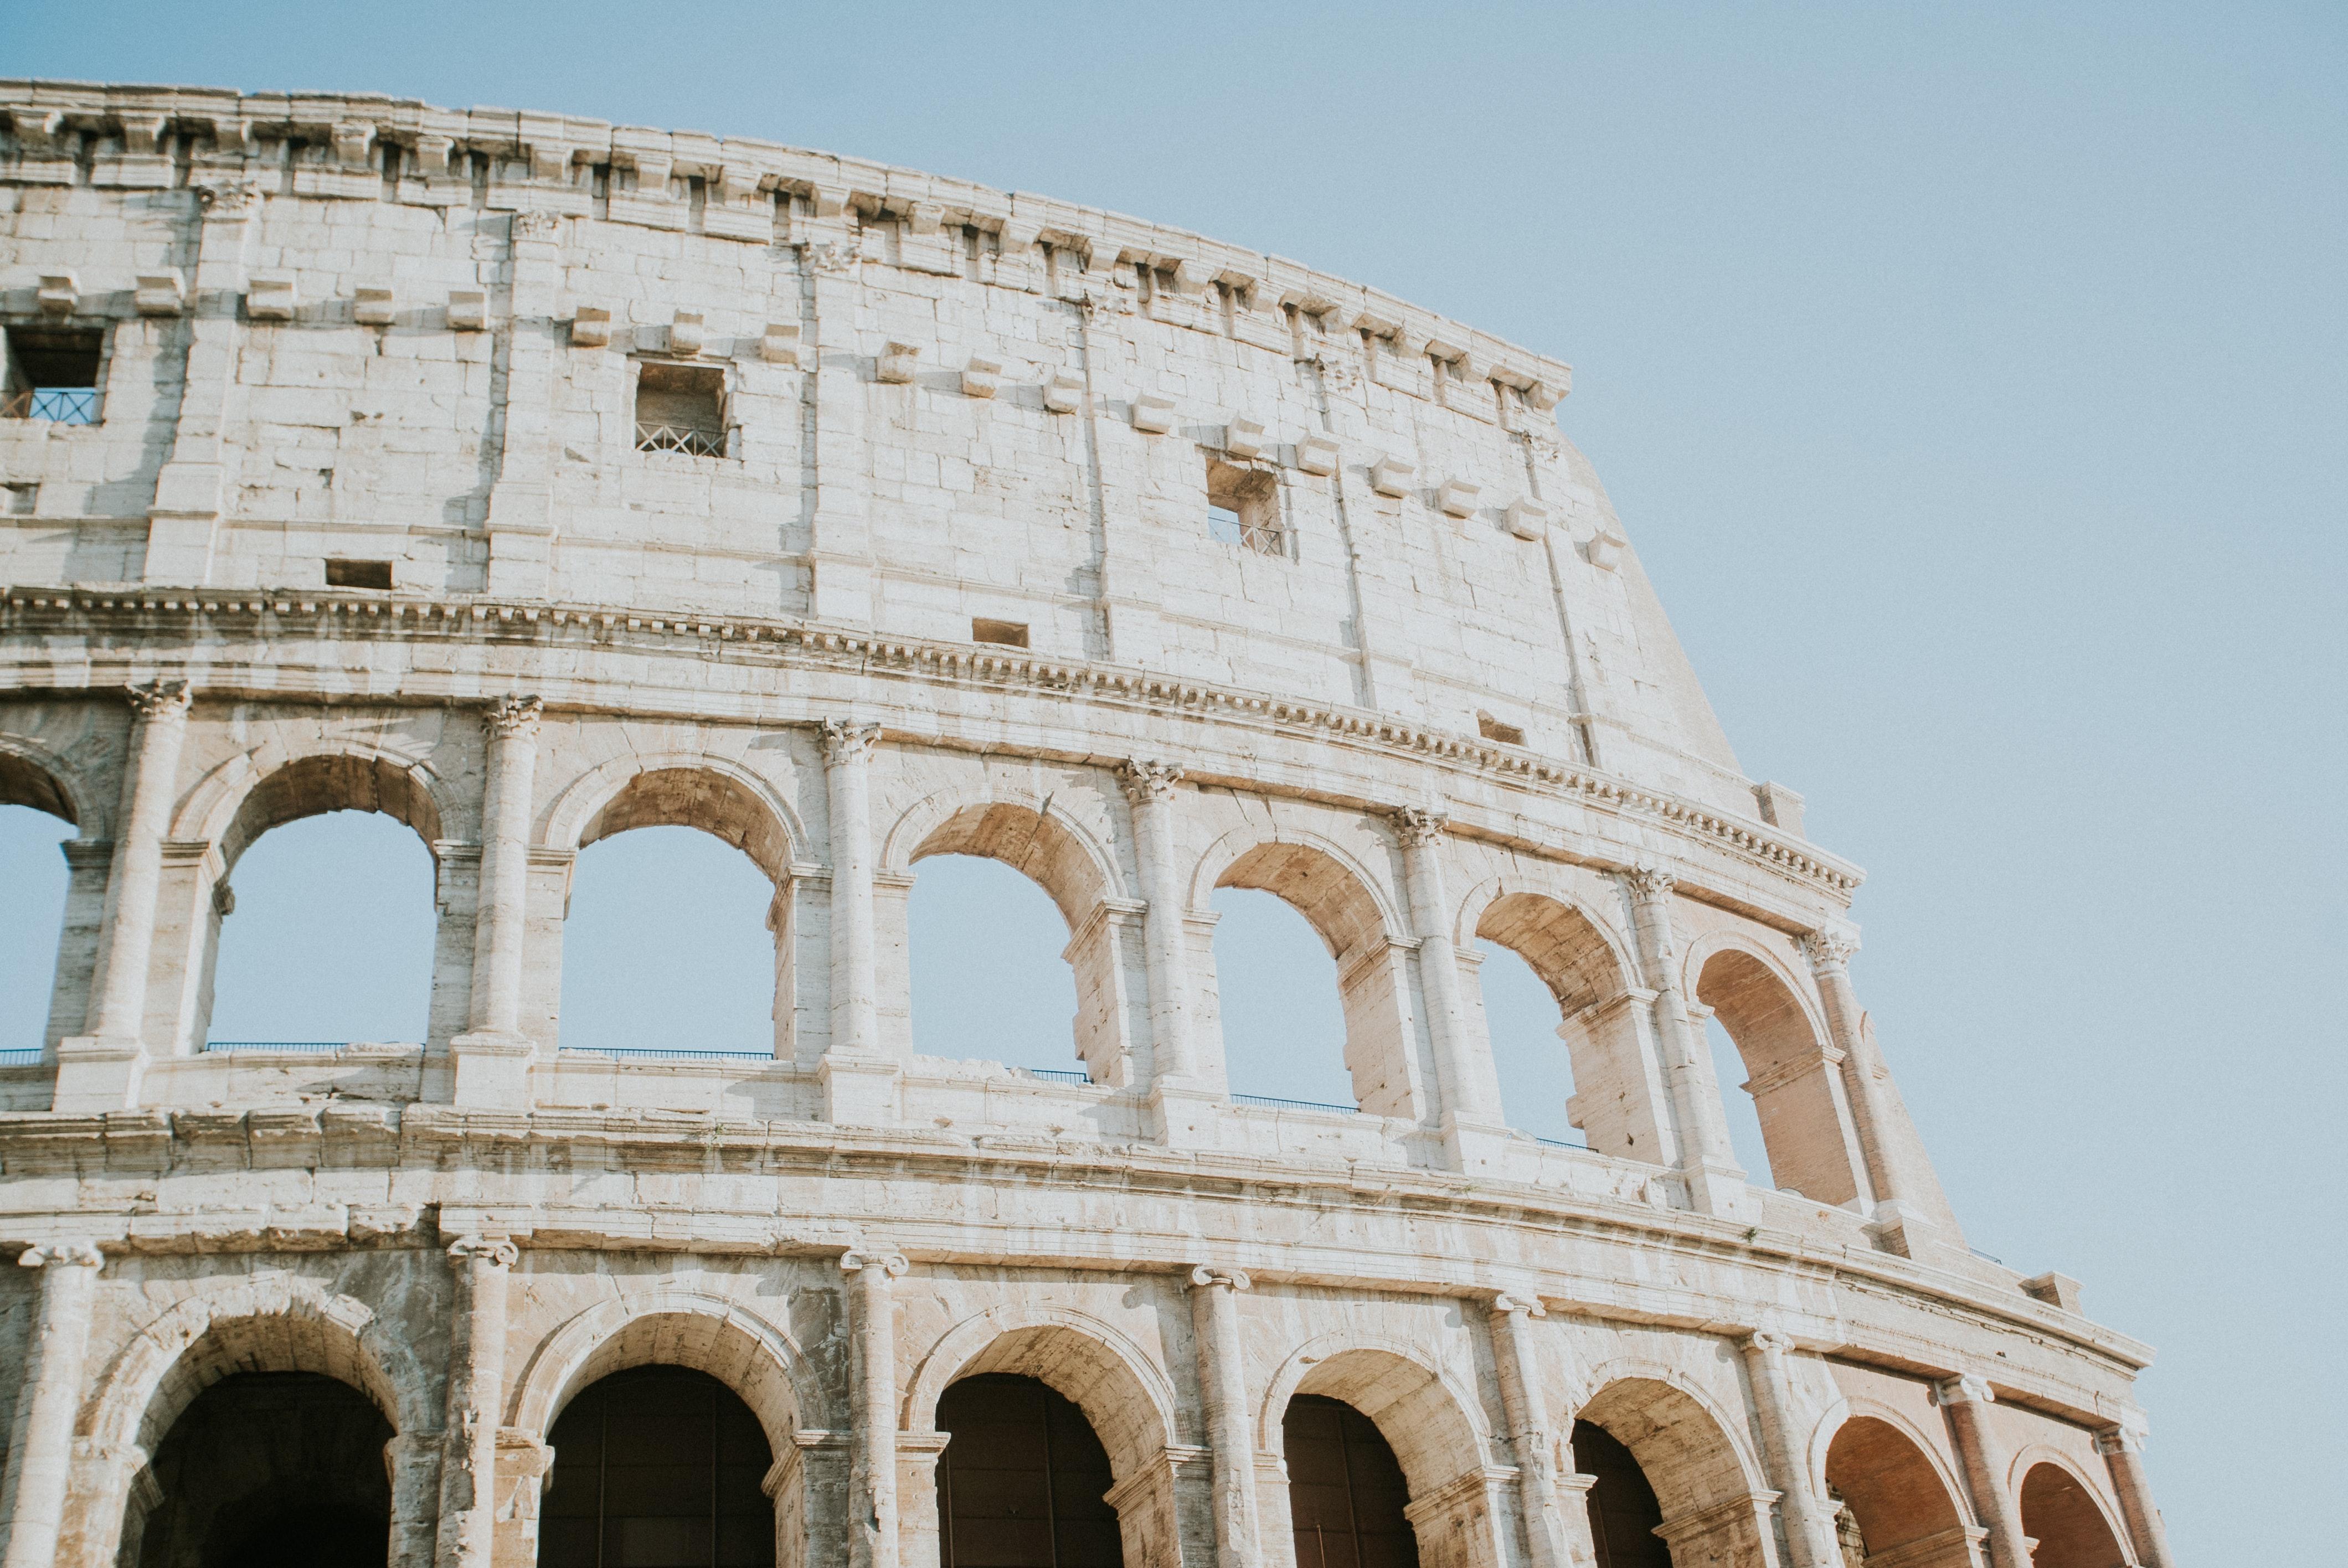 Roman Colosseum, Italy